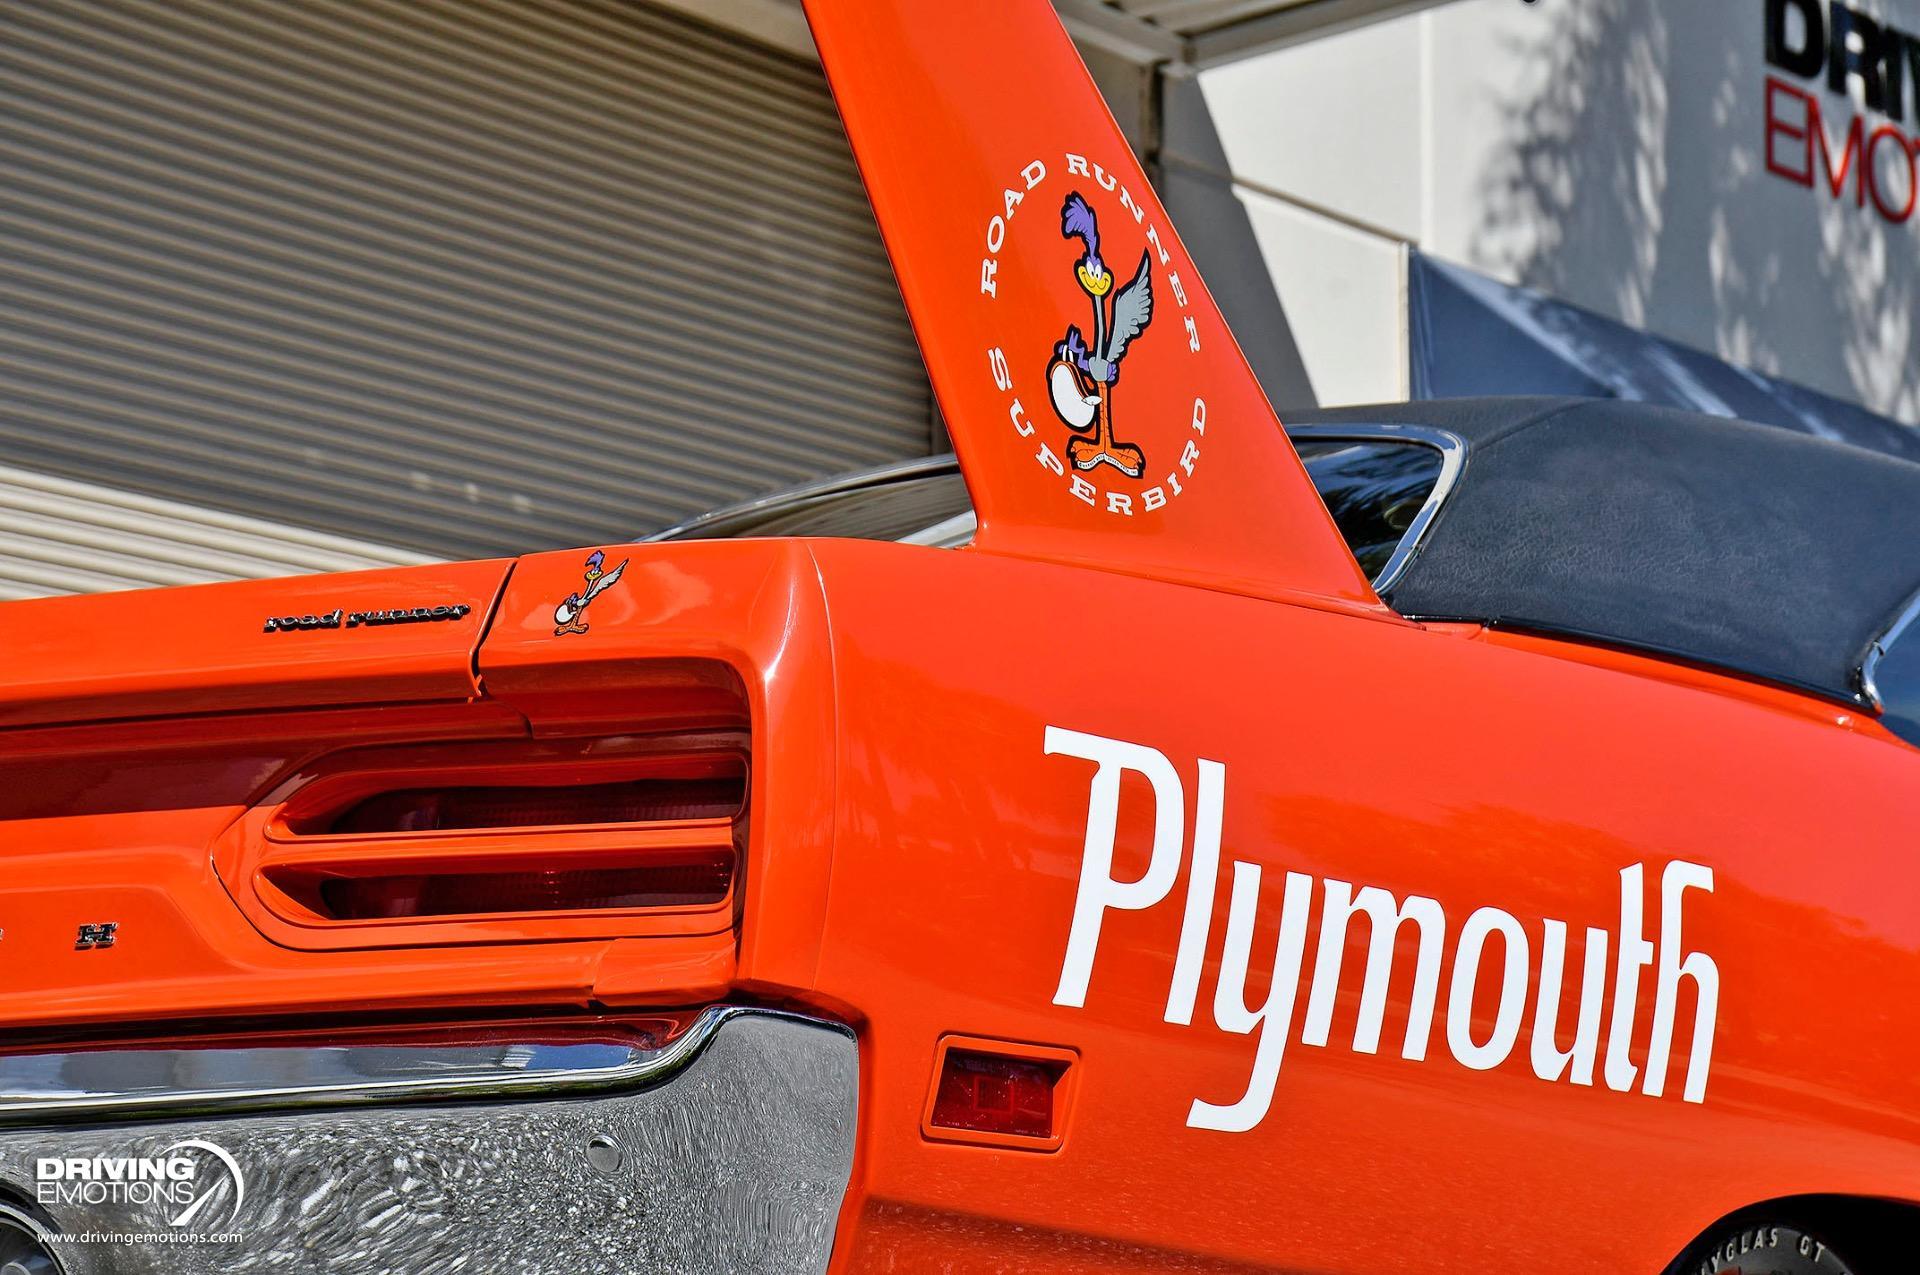 Used 1970 Plymouth Road Runner Superbird 440 Six Barrel 390HP V8   Lake Park, FL